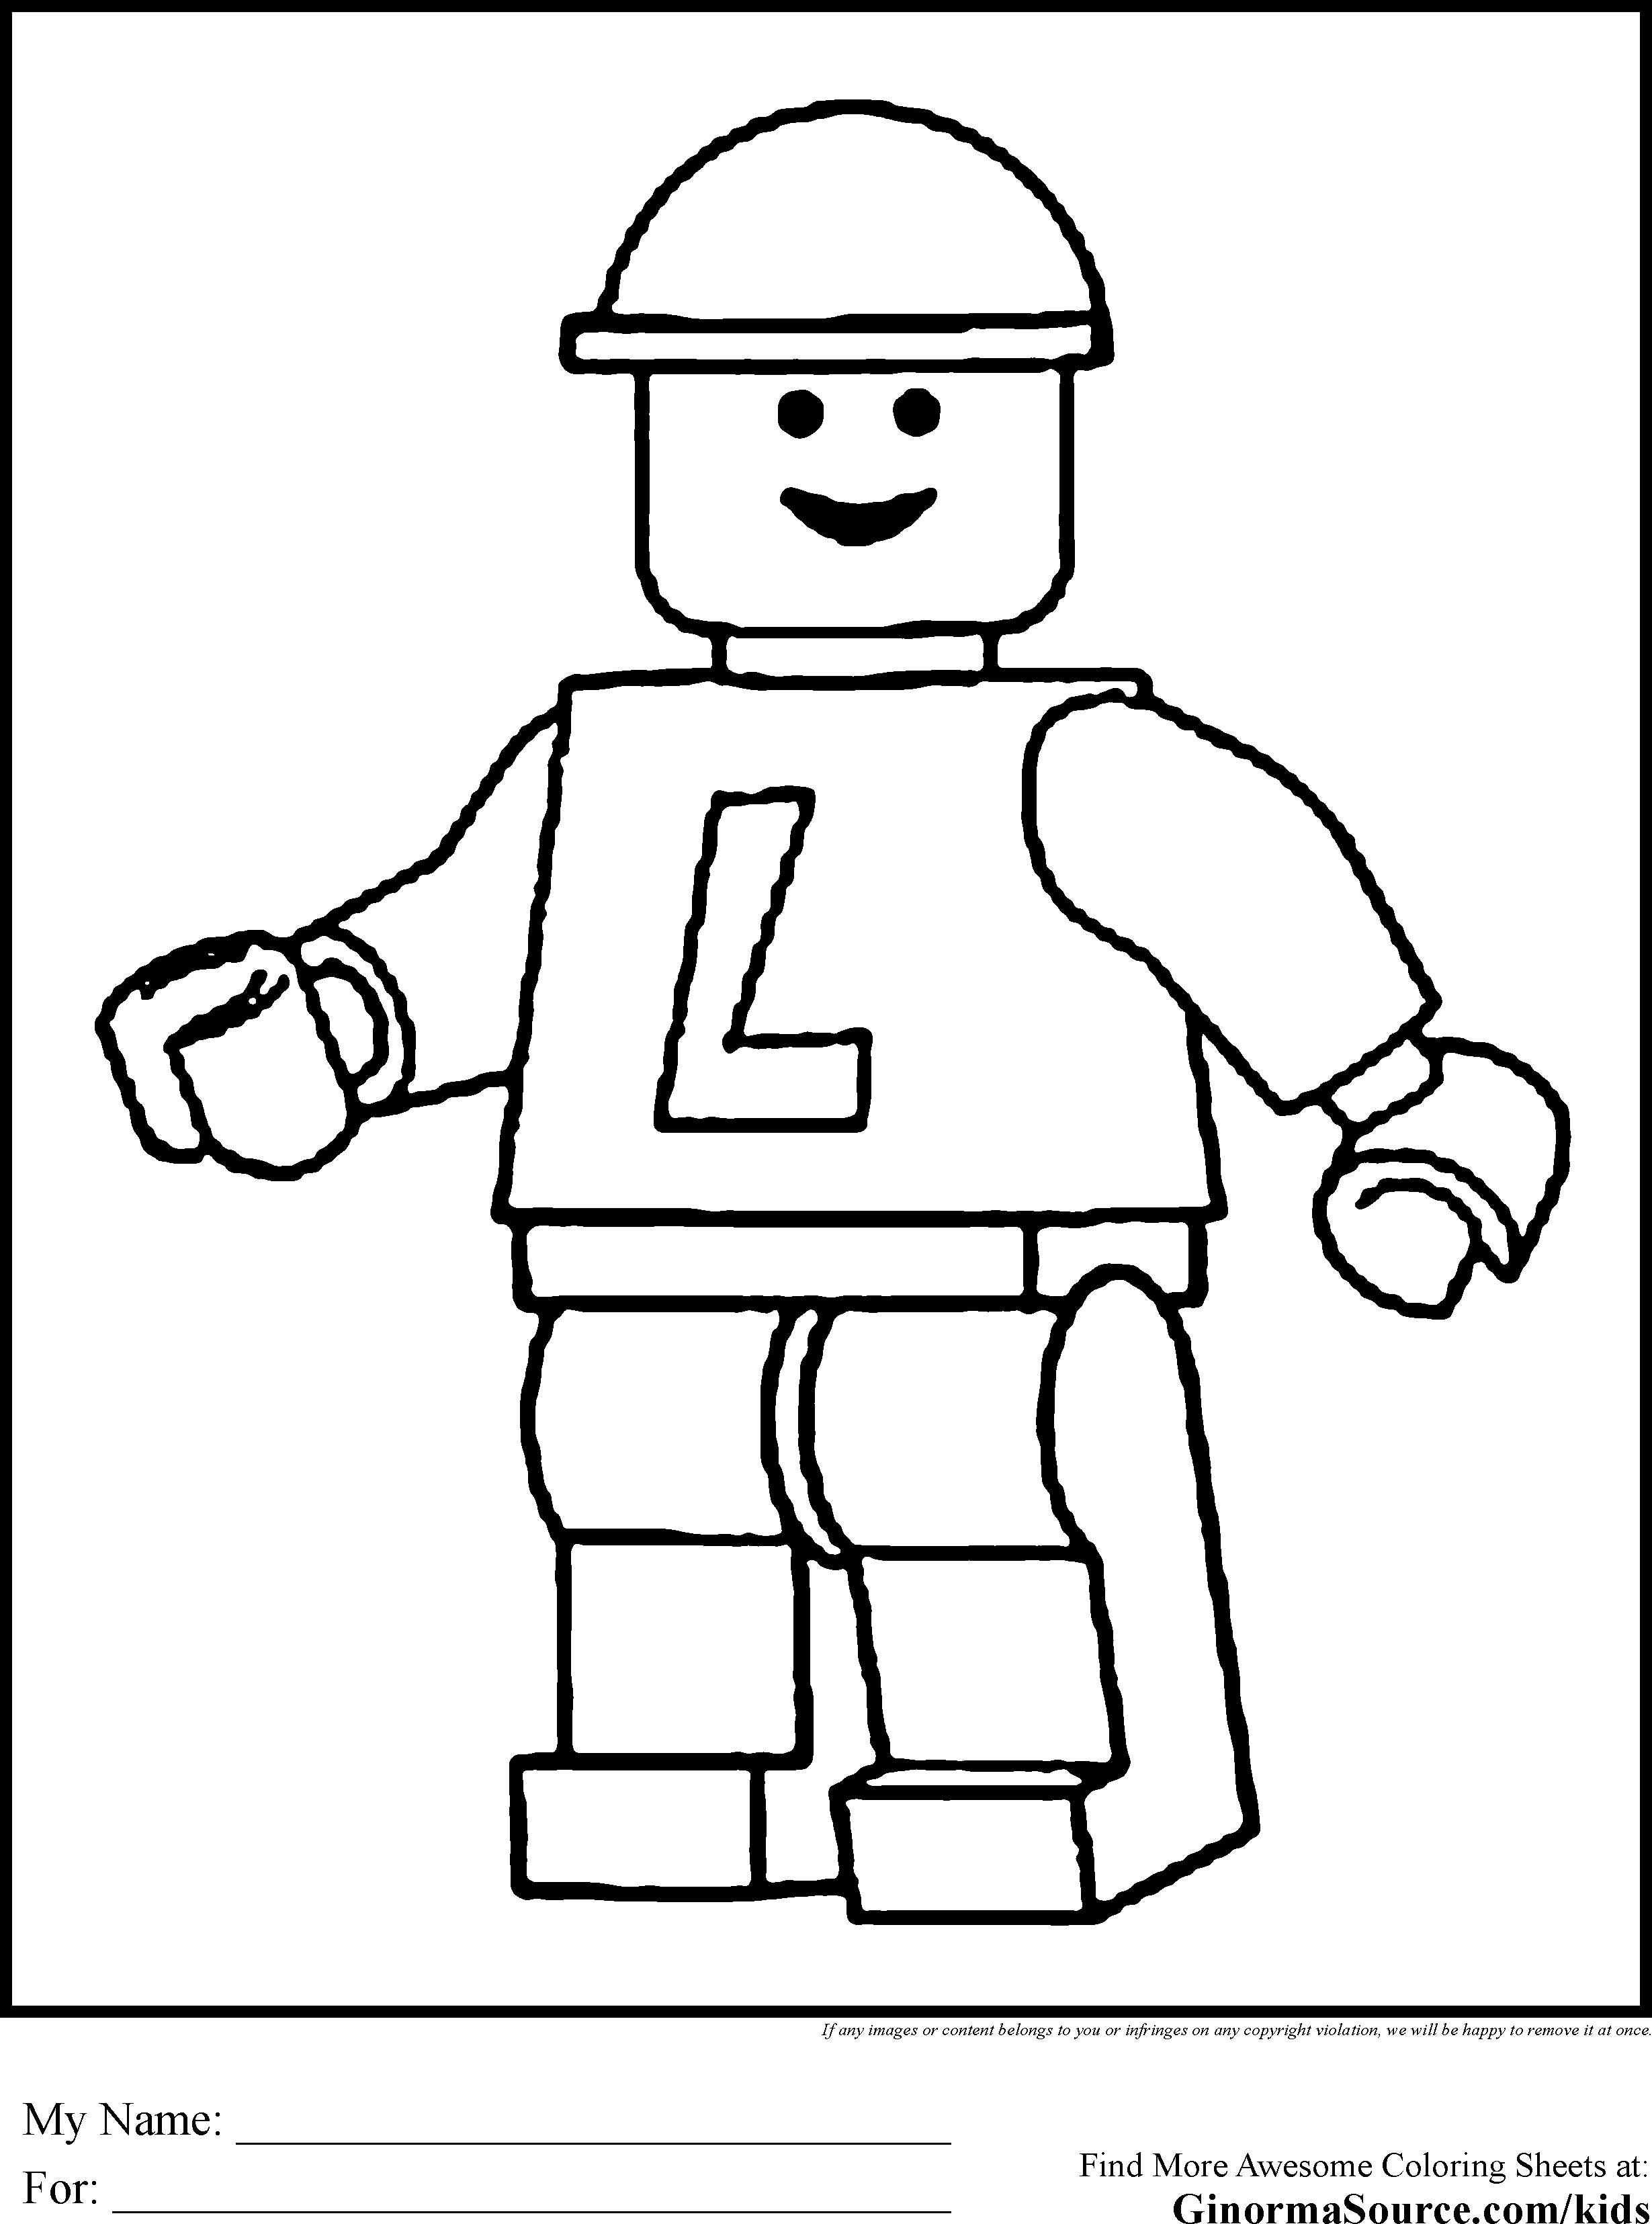 Lego Coloring Pages Legoman Gif 2 459 3 310 Pixels Lego Coloring Pages Lego Coloring Lego Coloring Sheet